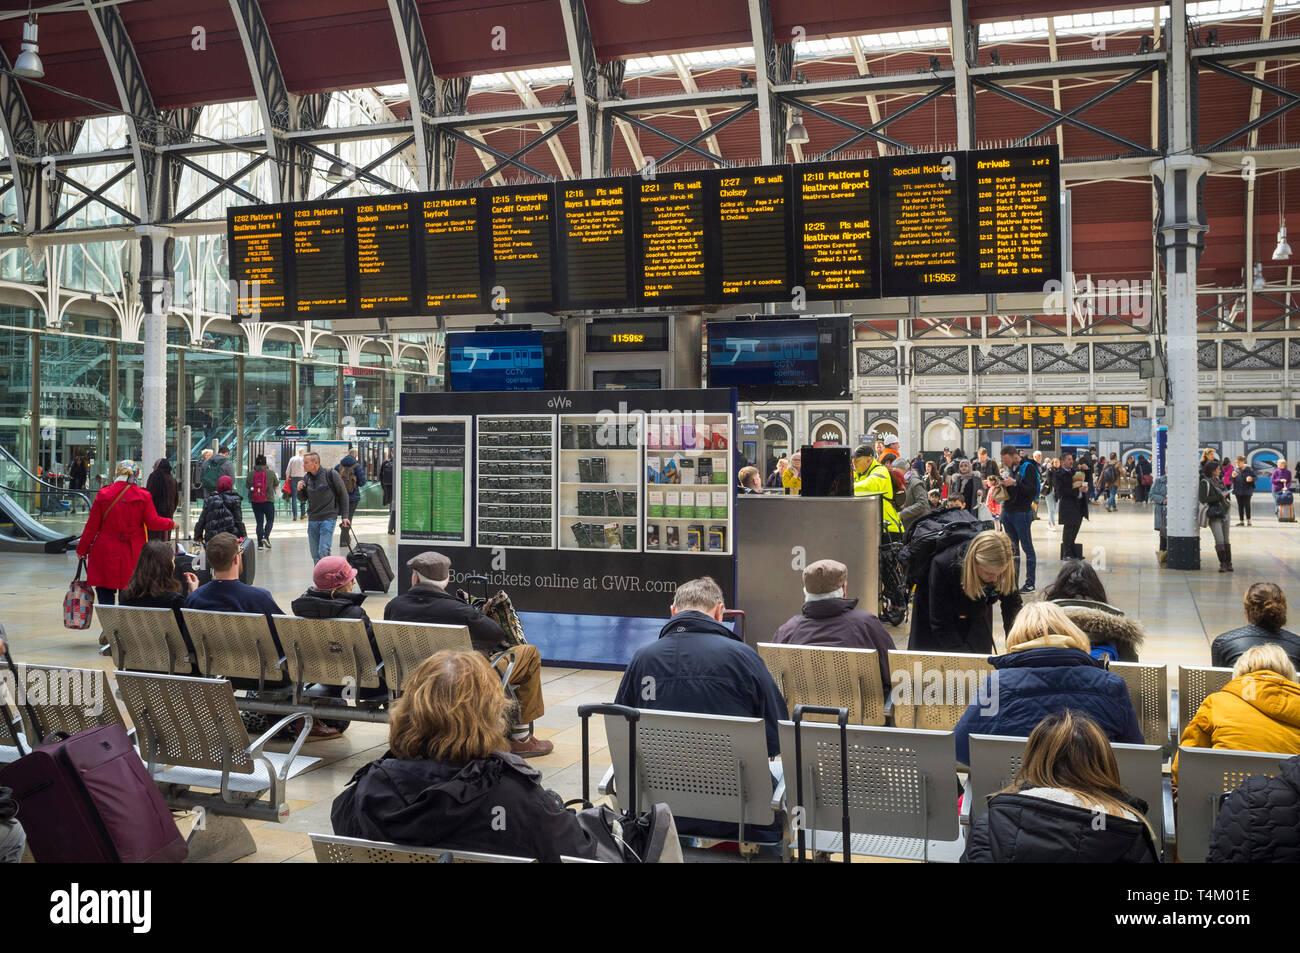 Travellers waiting by the illuminated display board at Paddington Station, london Stock Photo